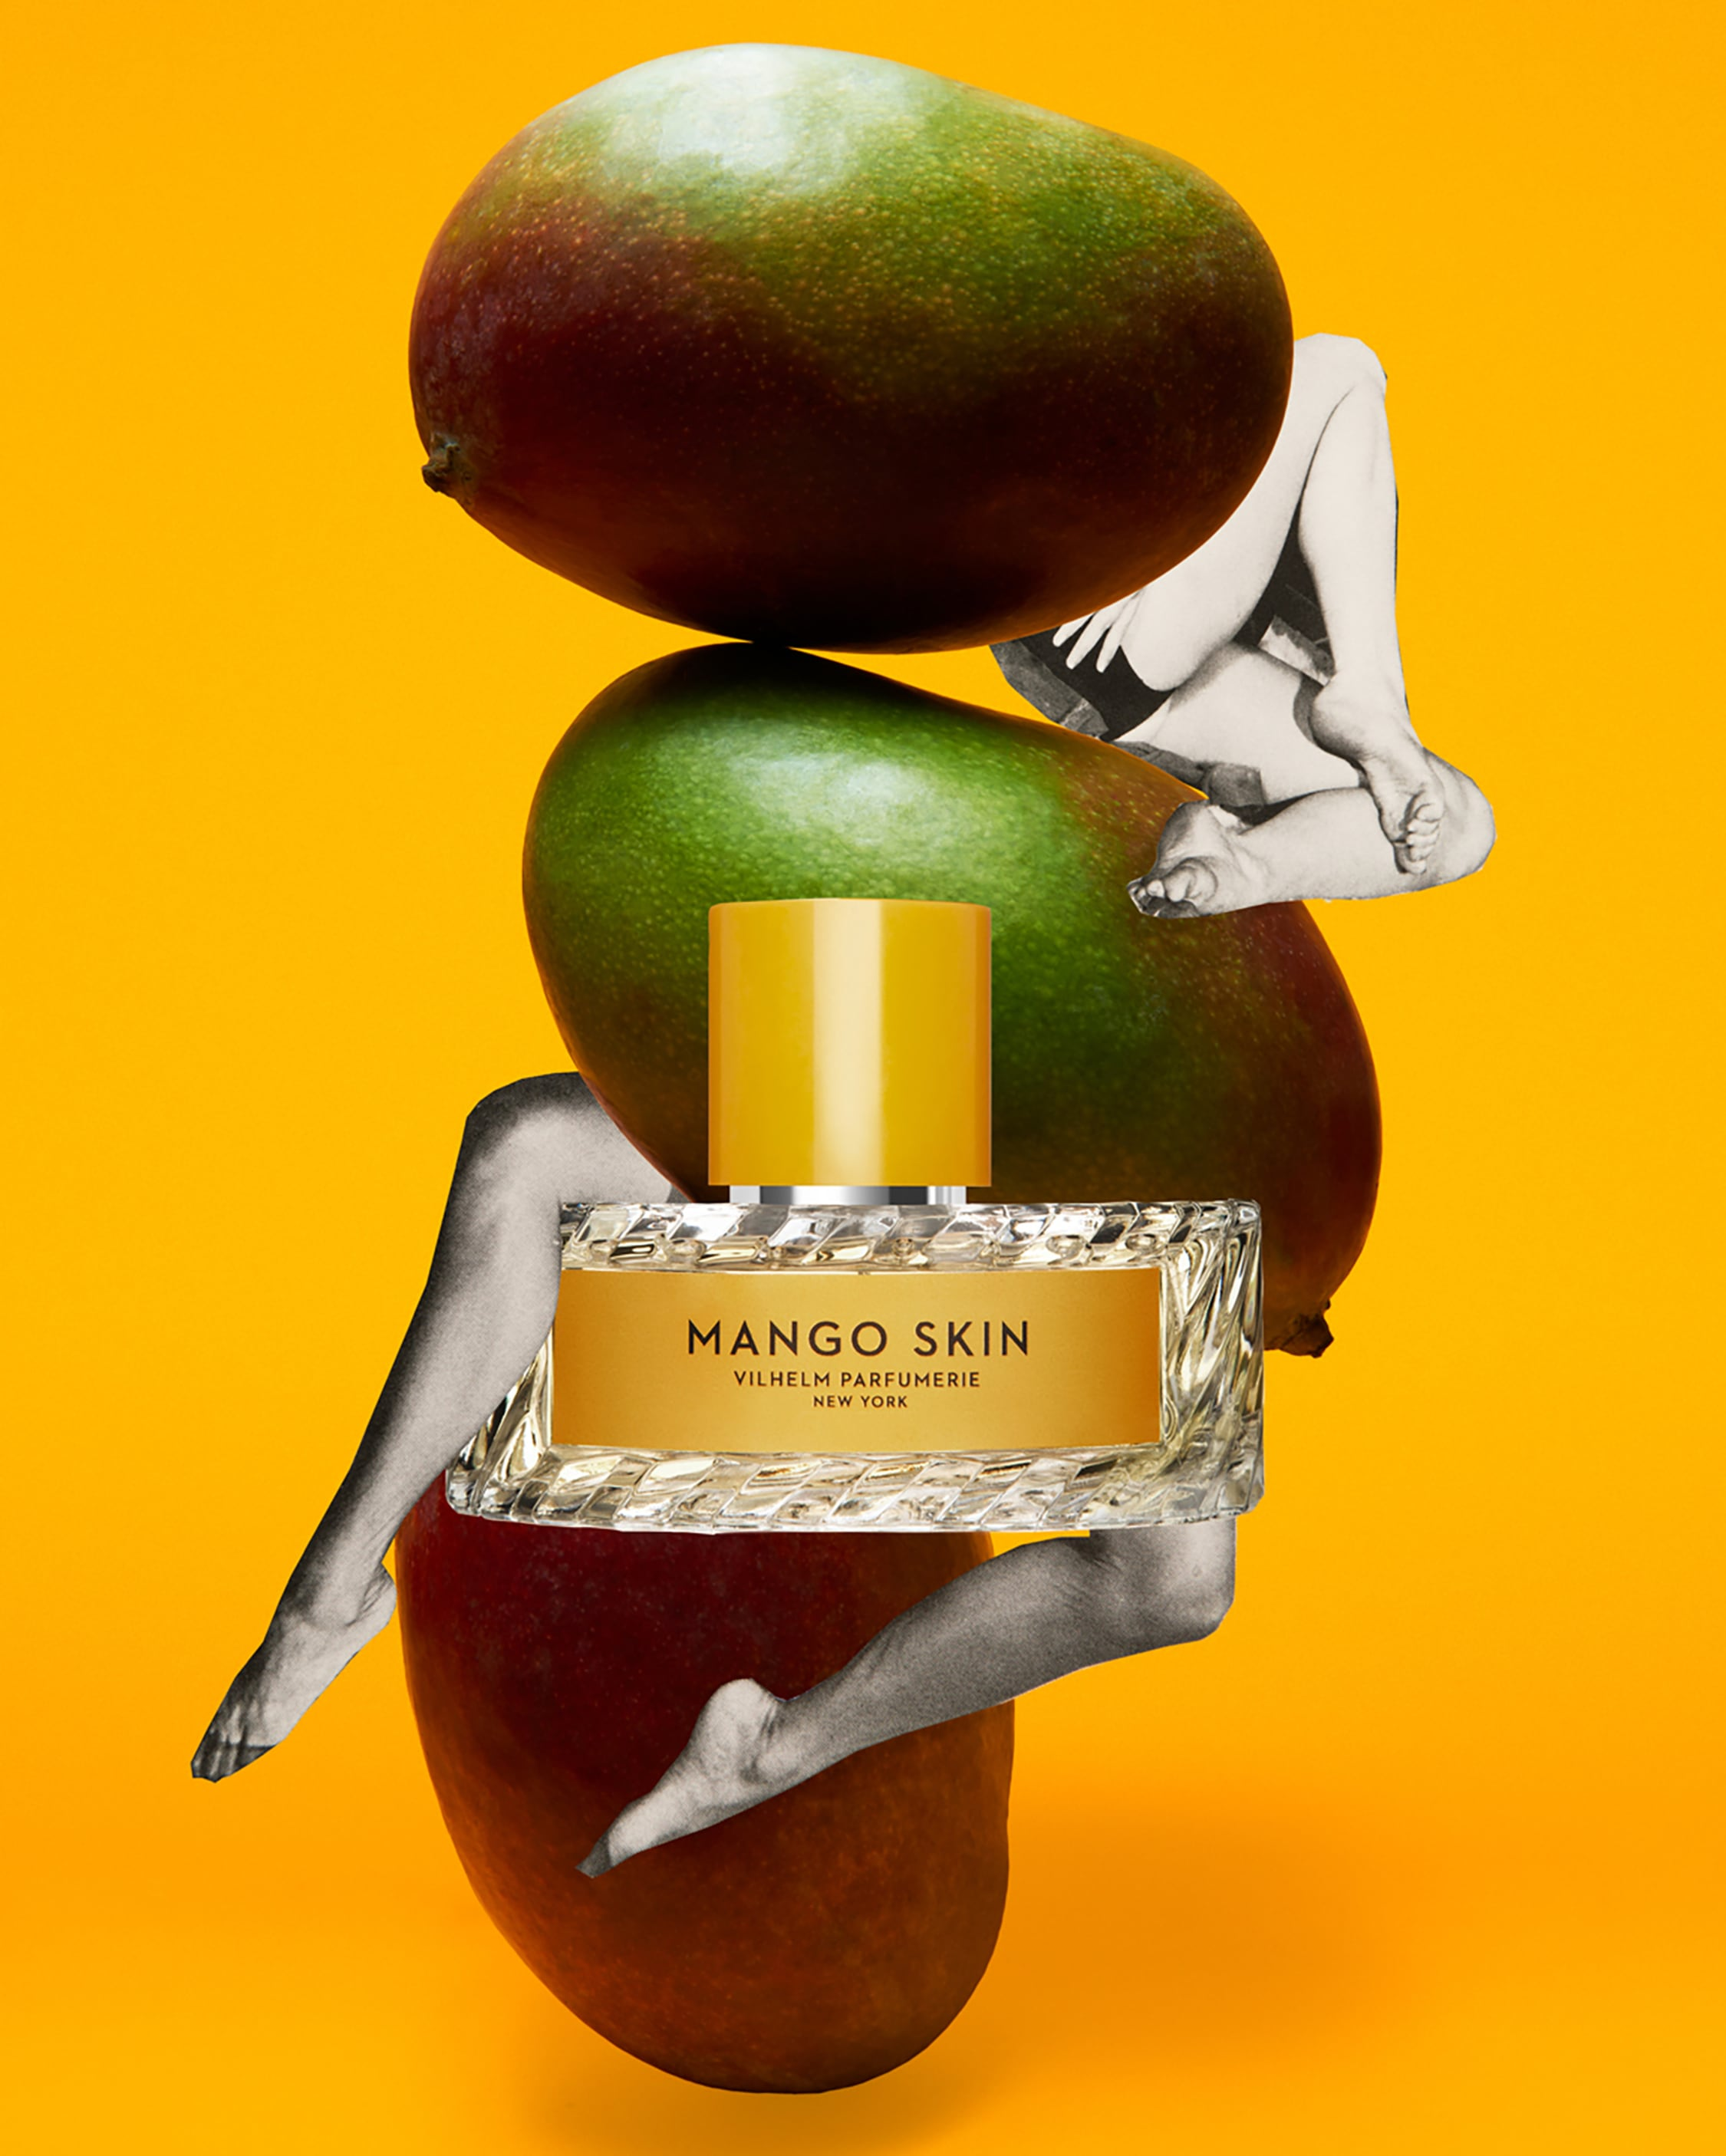 Vilhelm Perfumerie Mango Skin Eau de Parfum 50ml 2